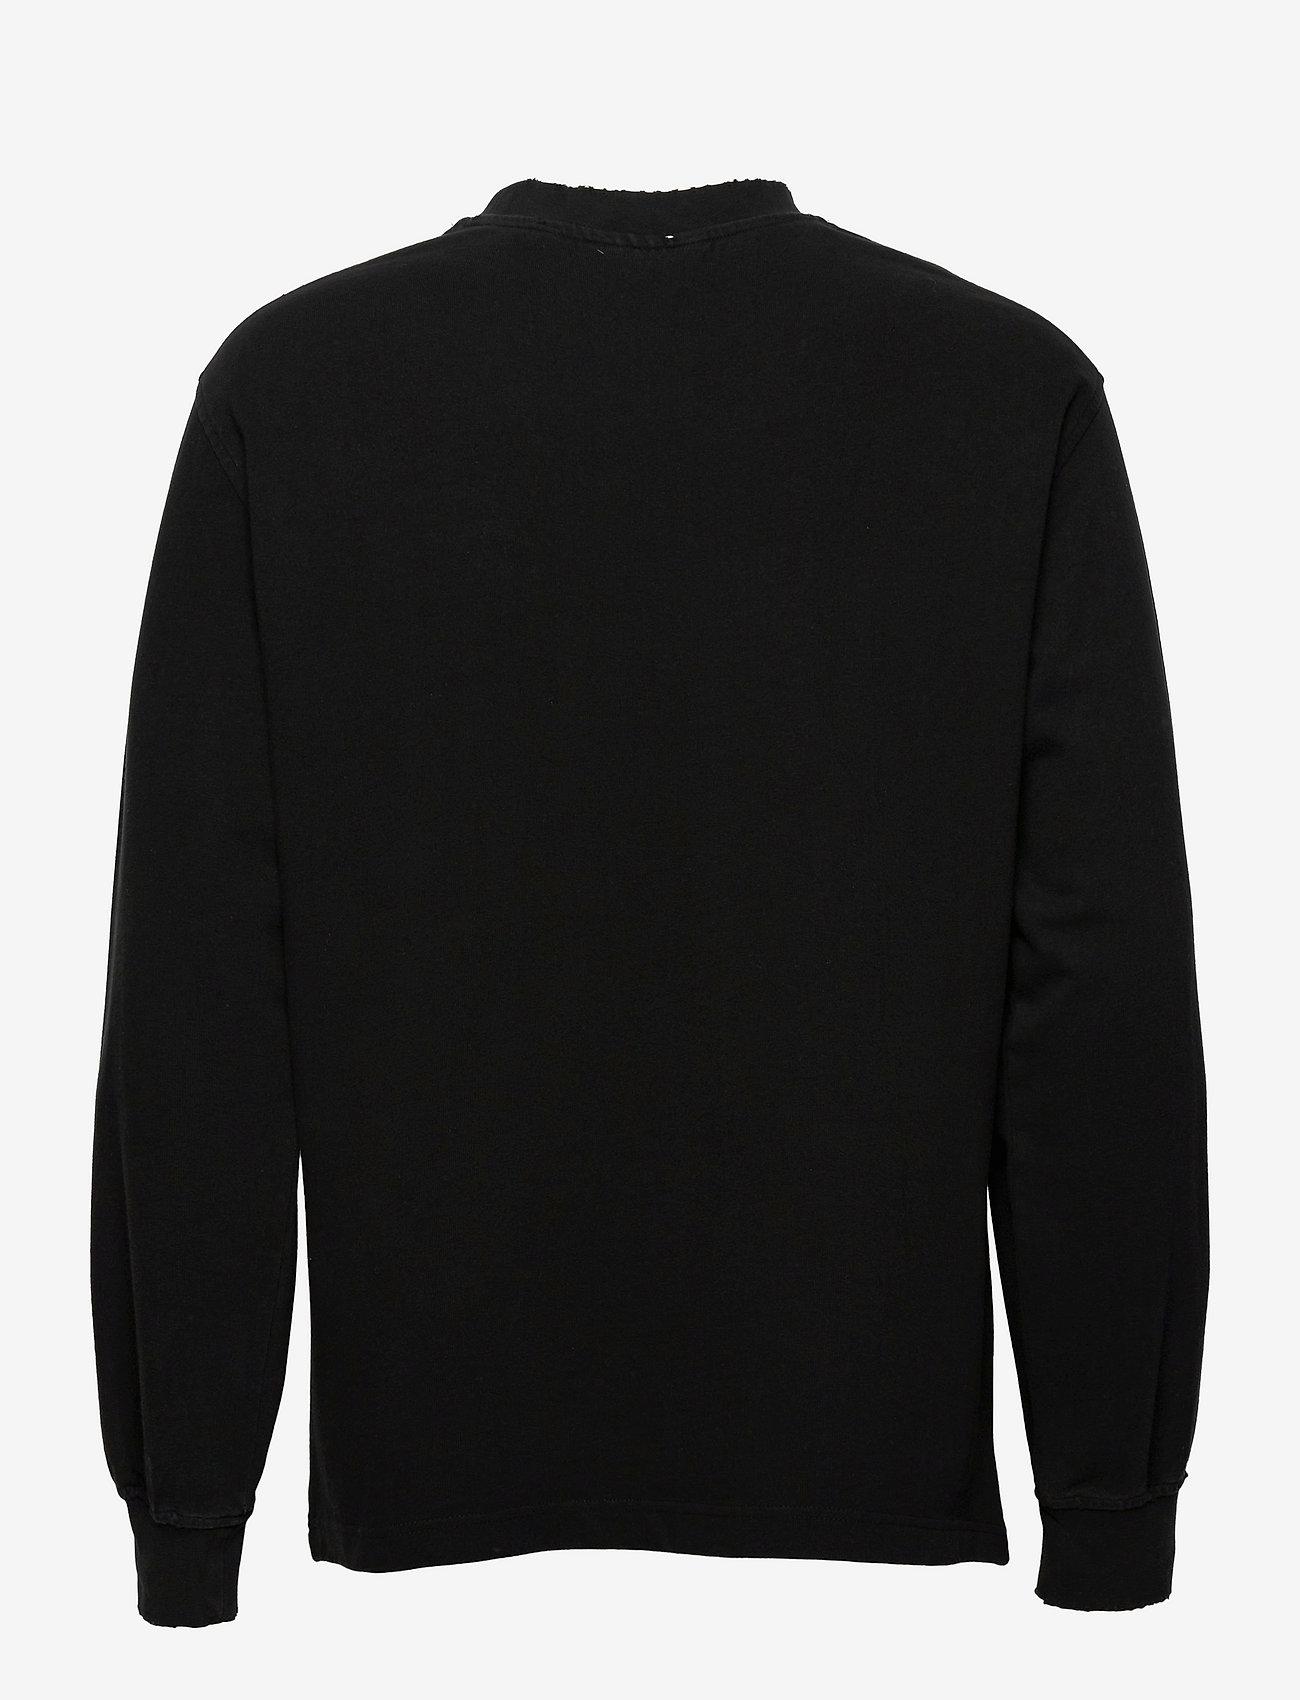 HAN Kjøbenhavn - Distressed Tee Long Sleeve - basic t-shirts - distressed black - 1